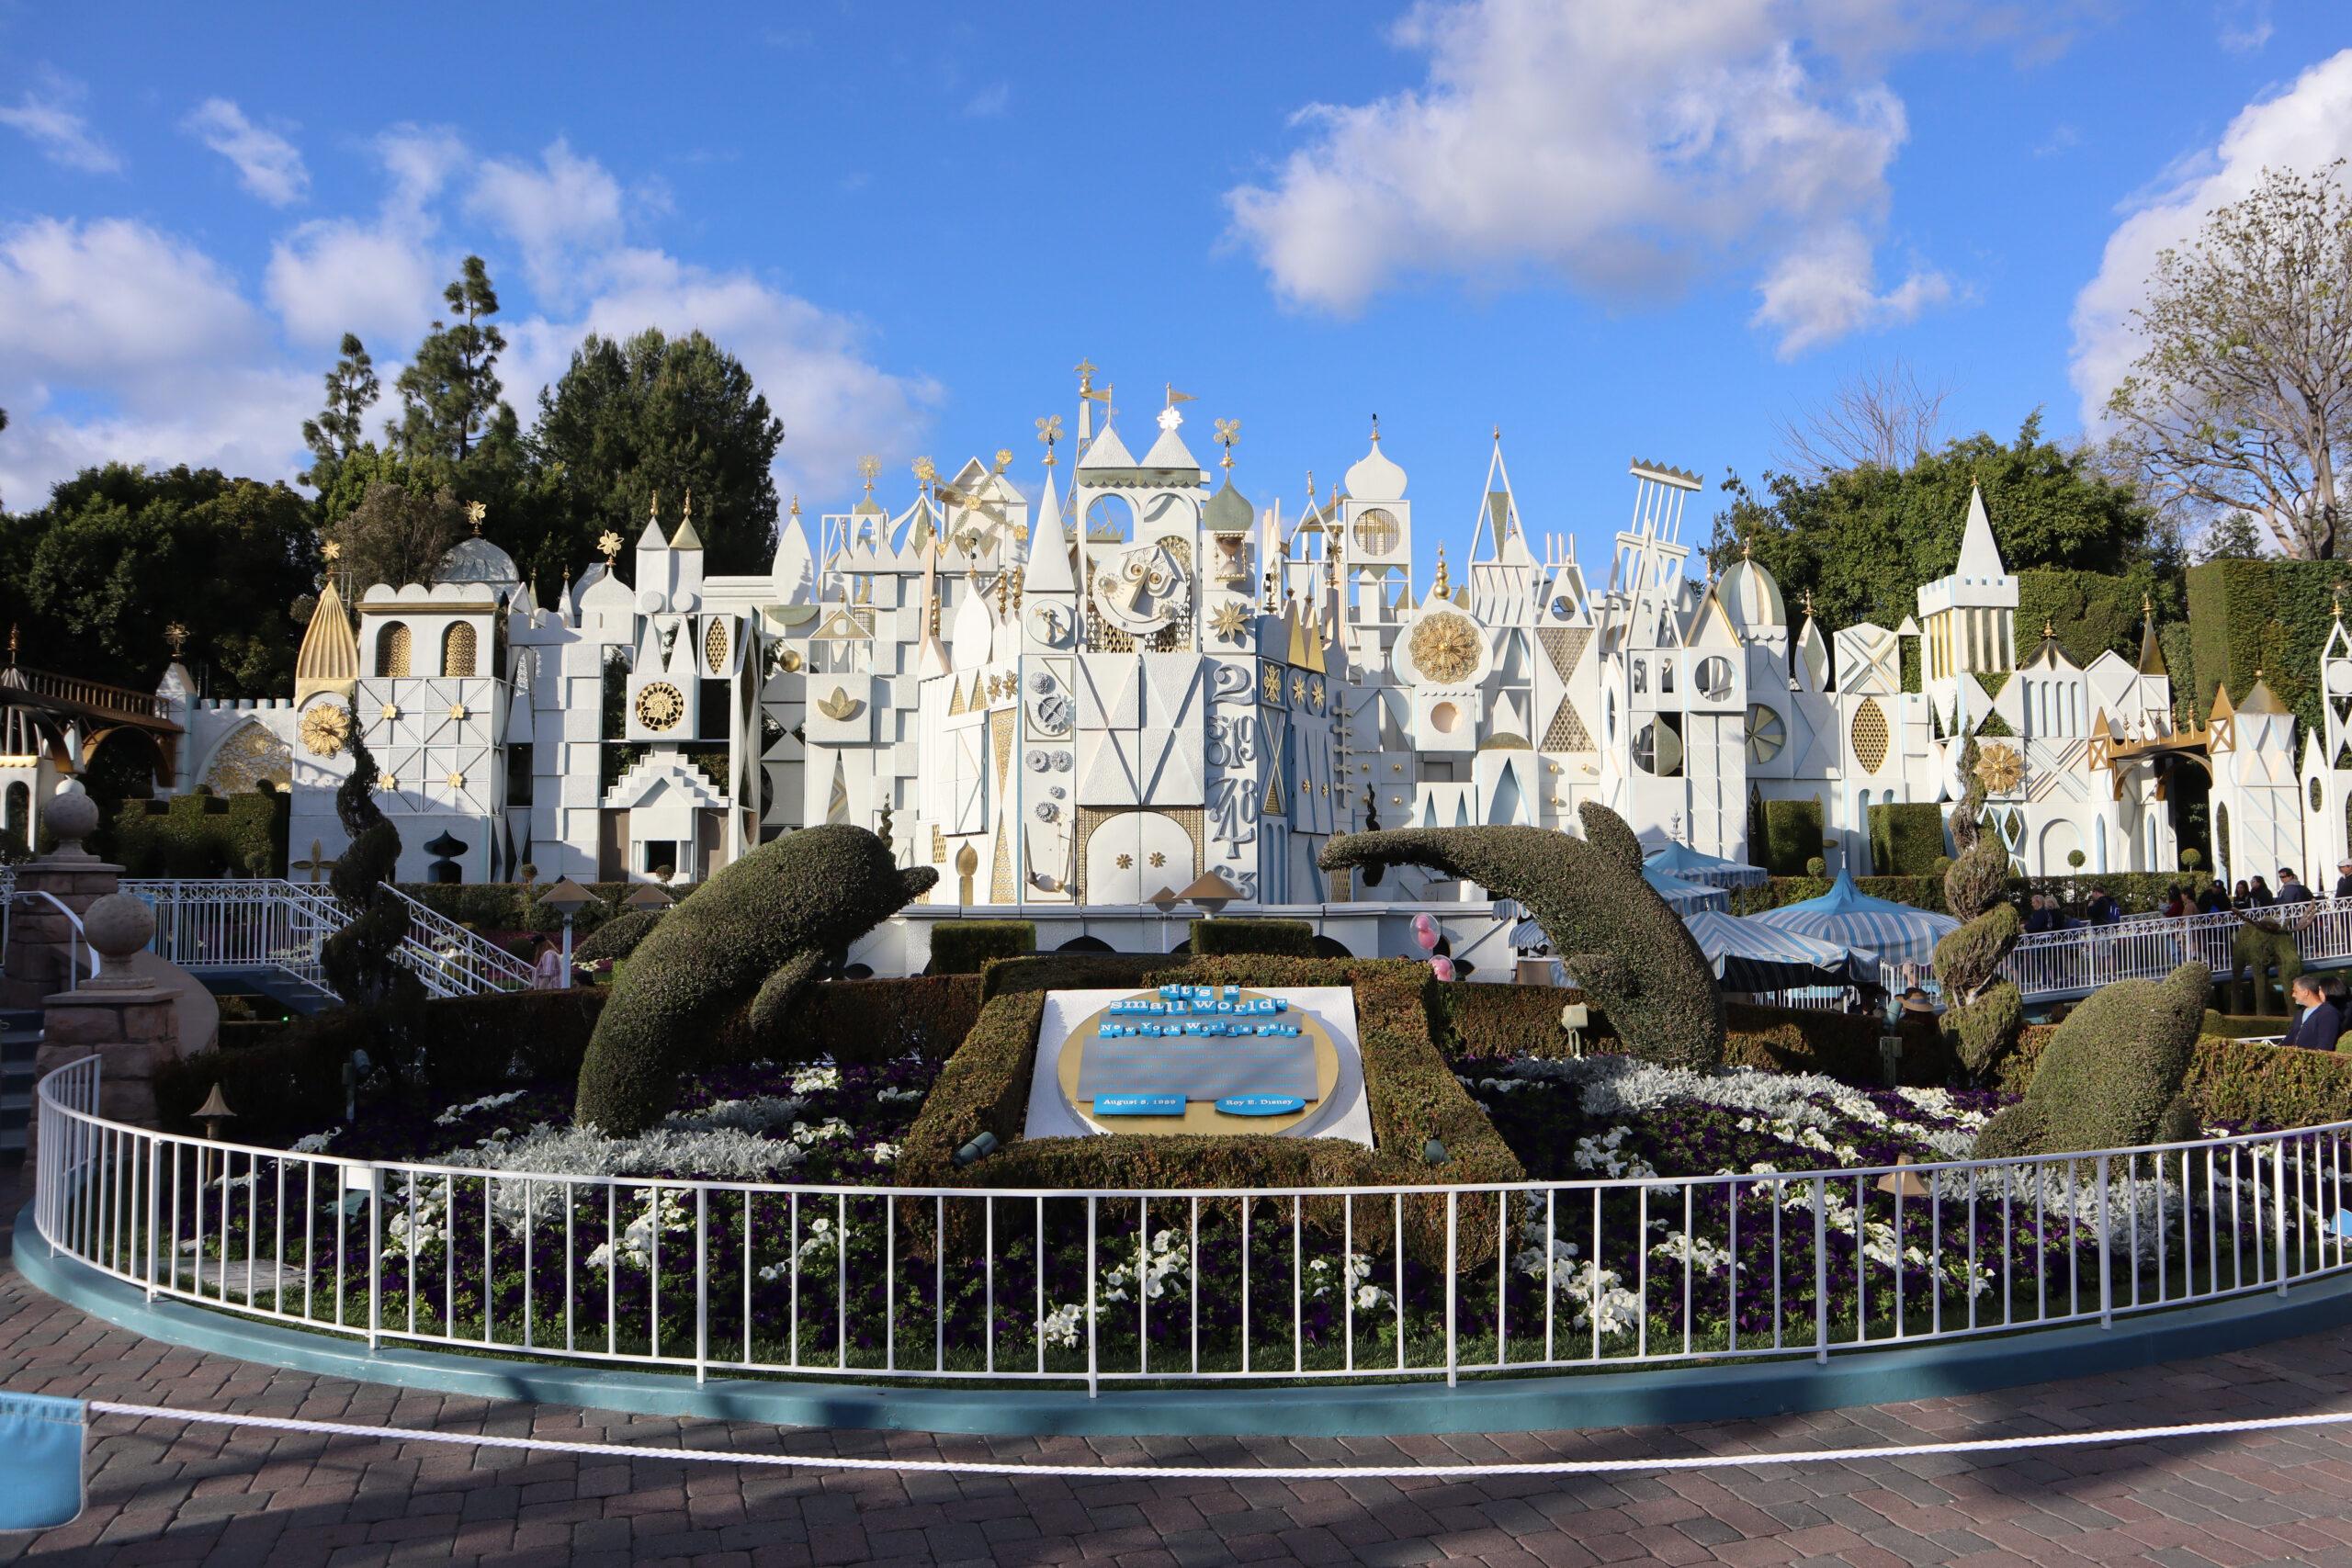 A Ranking Of Every Ride At Disneyland - Ian Thomas Maloneian